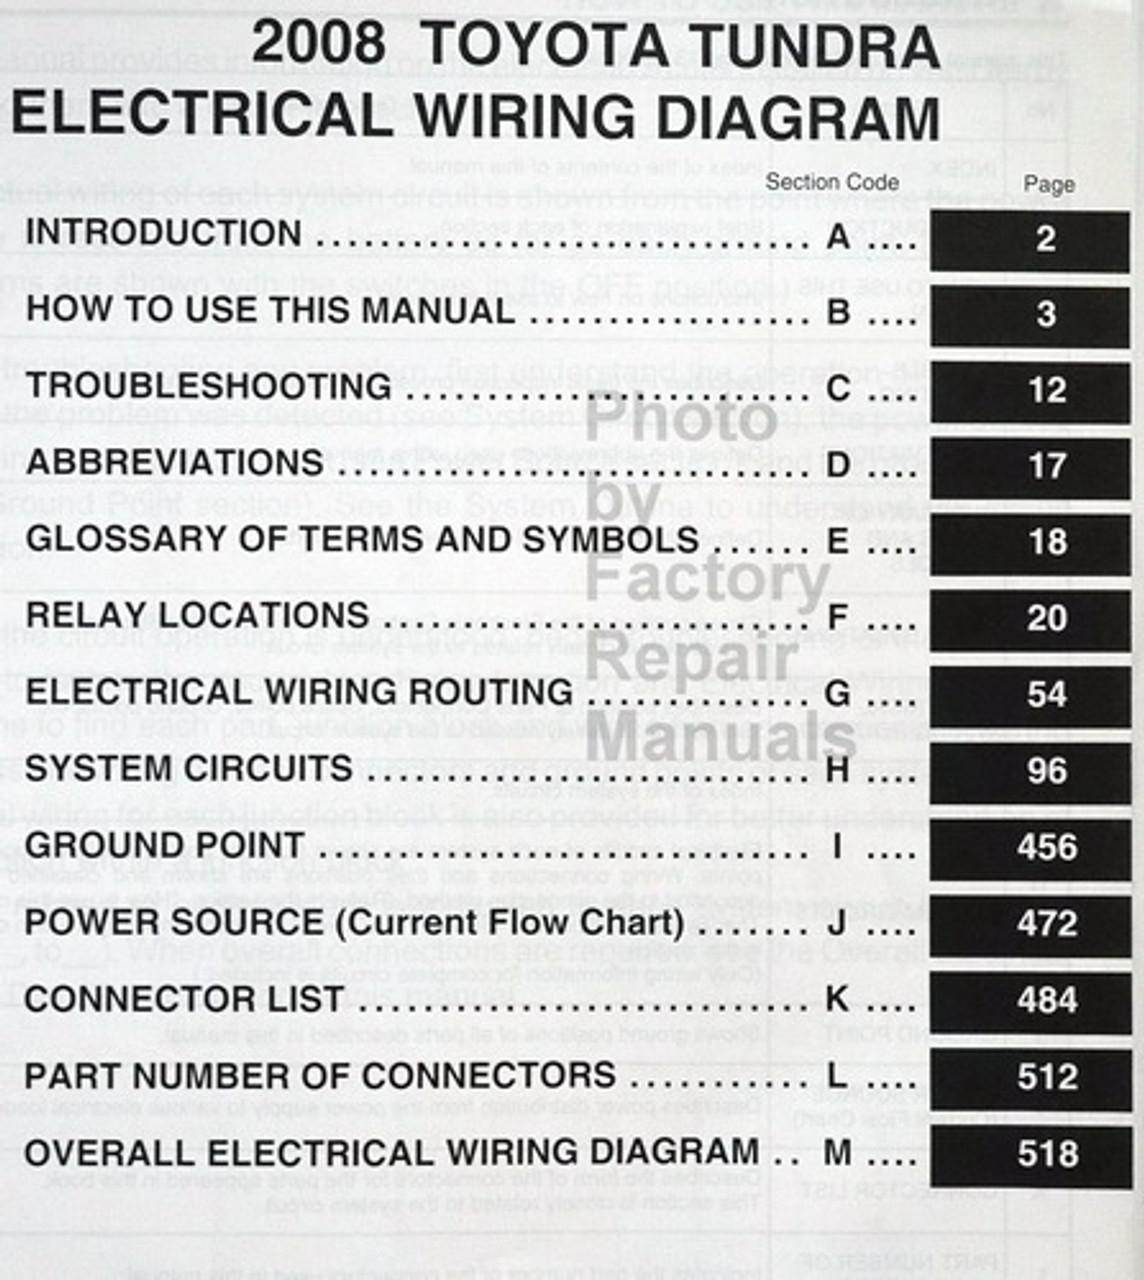 2008 Toyota Tundra Electrical Wiring Diagrams Original